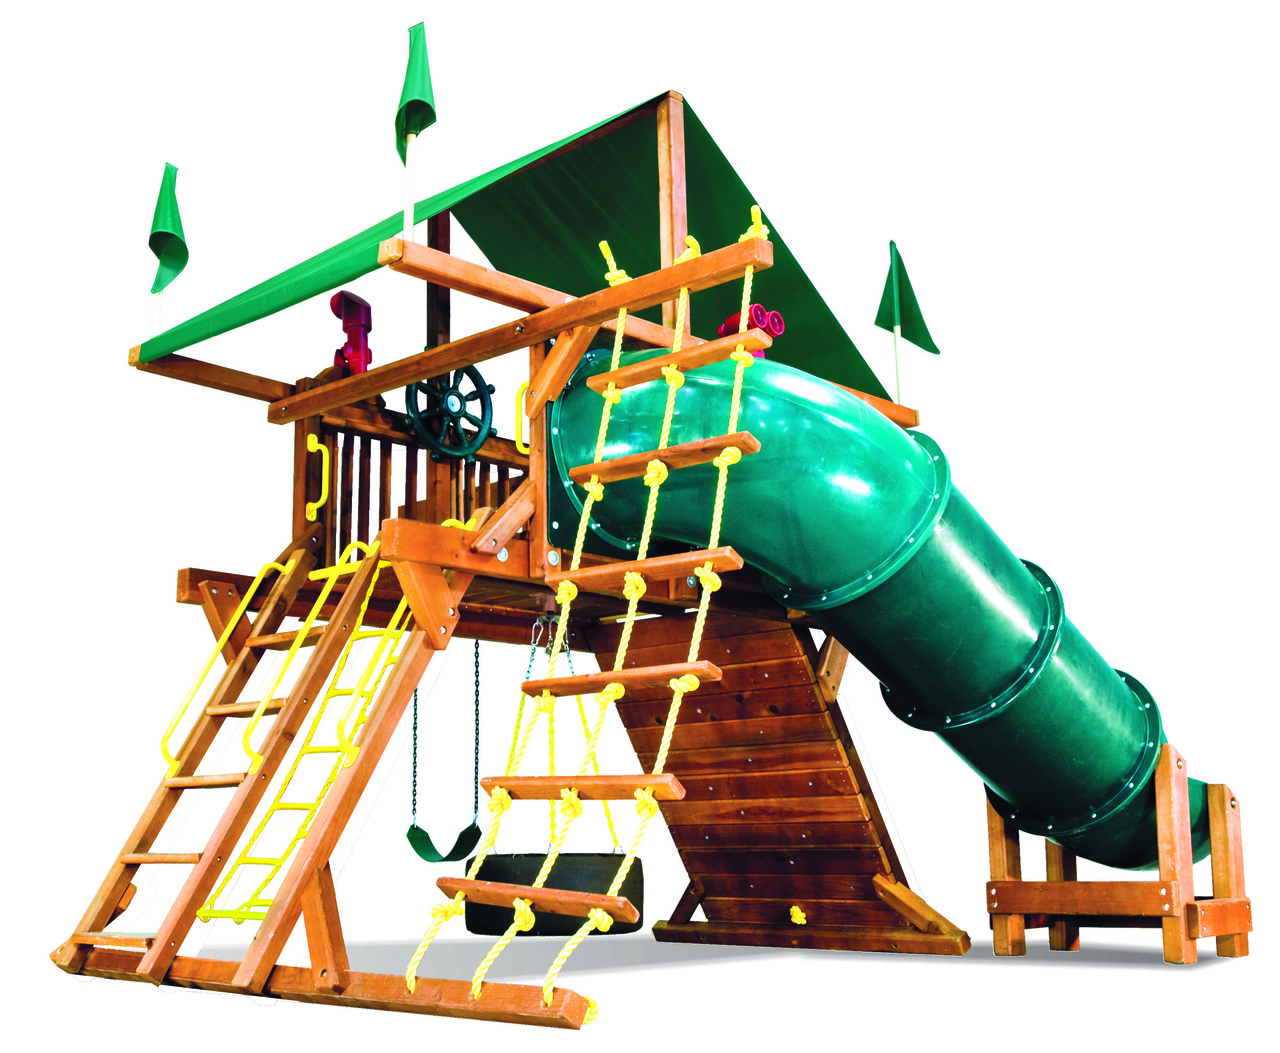 Саншайн Кастл I СпейсСейвер Тент (Sunshine Castle Pkg I Spacesaver with 90 Tube Slide RYB)